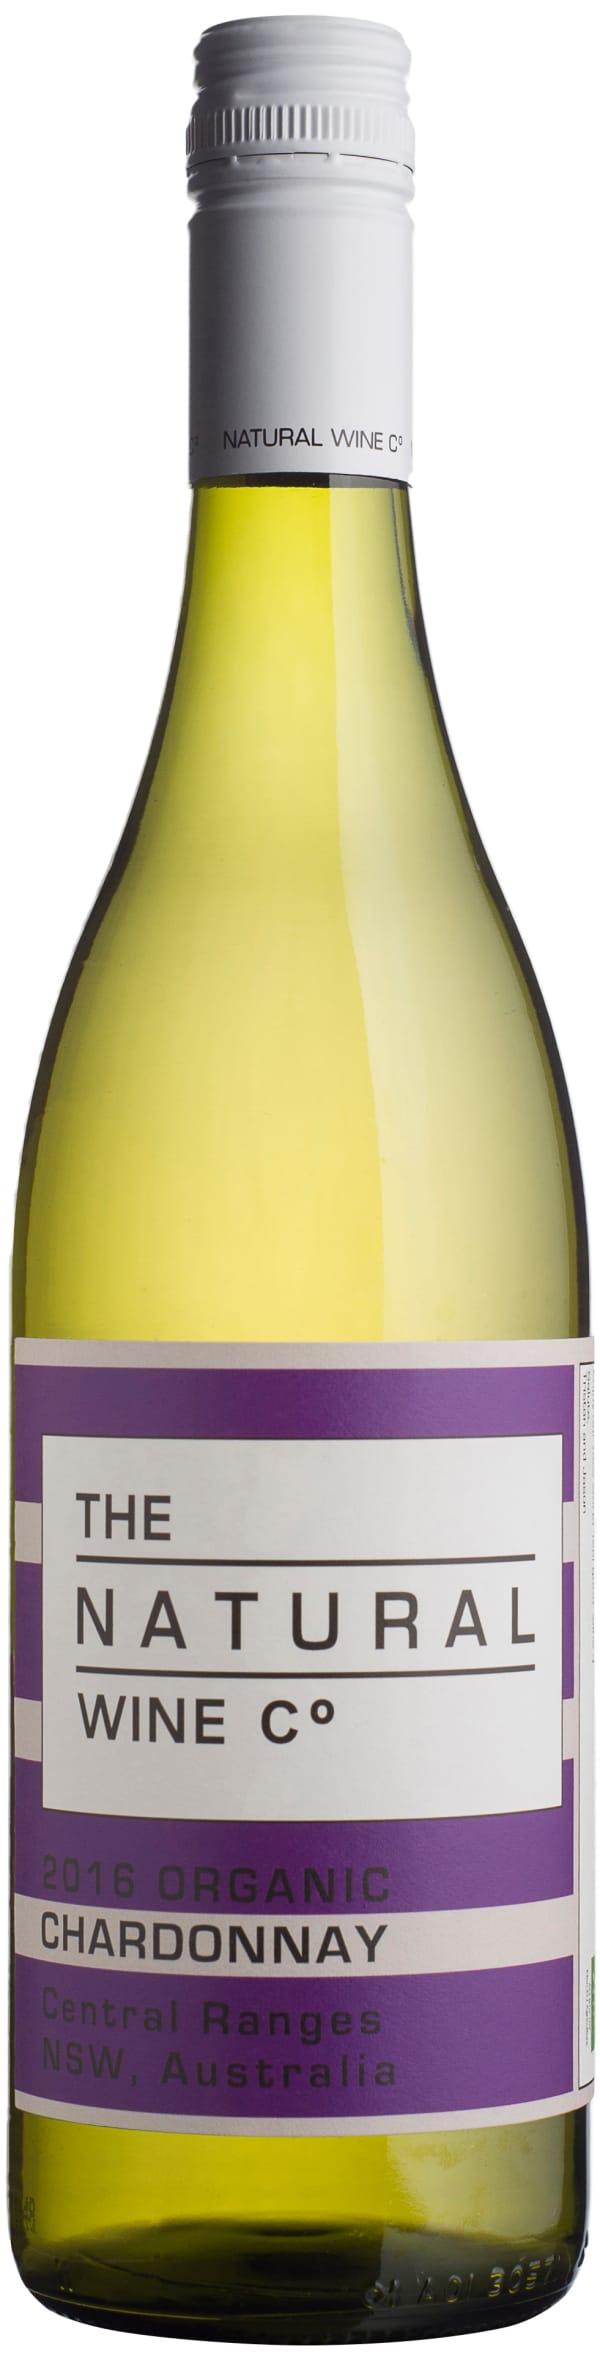 The Natural Wine Co Organic Chardonnay 2017